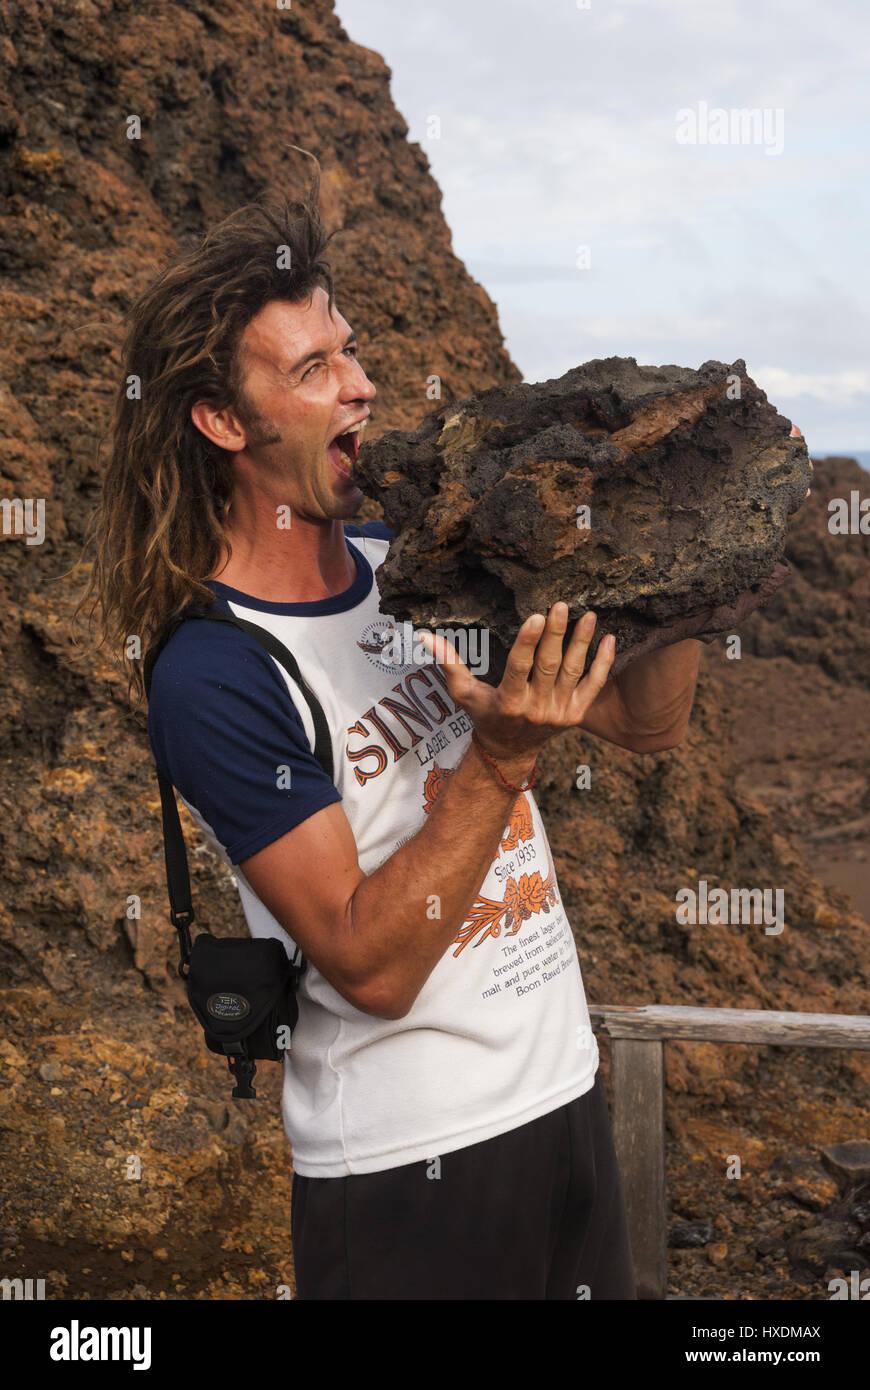 Ecuador, Galapagos, Bartolome island, Visitor with feather-light pumice boulder - Stock Image